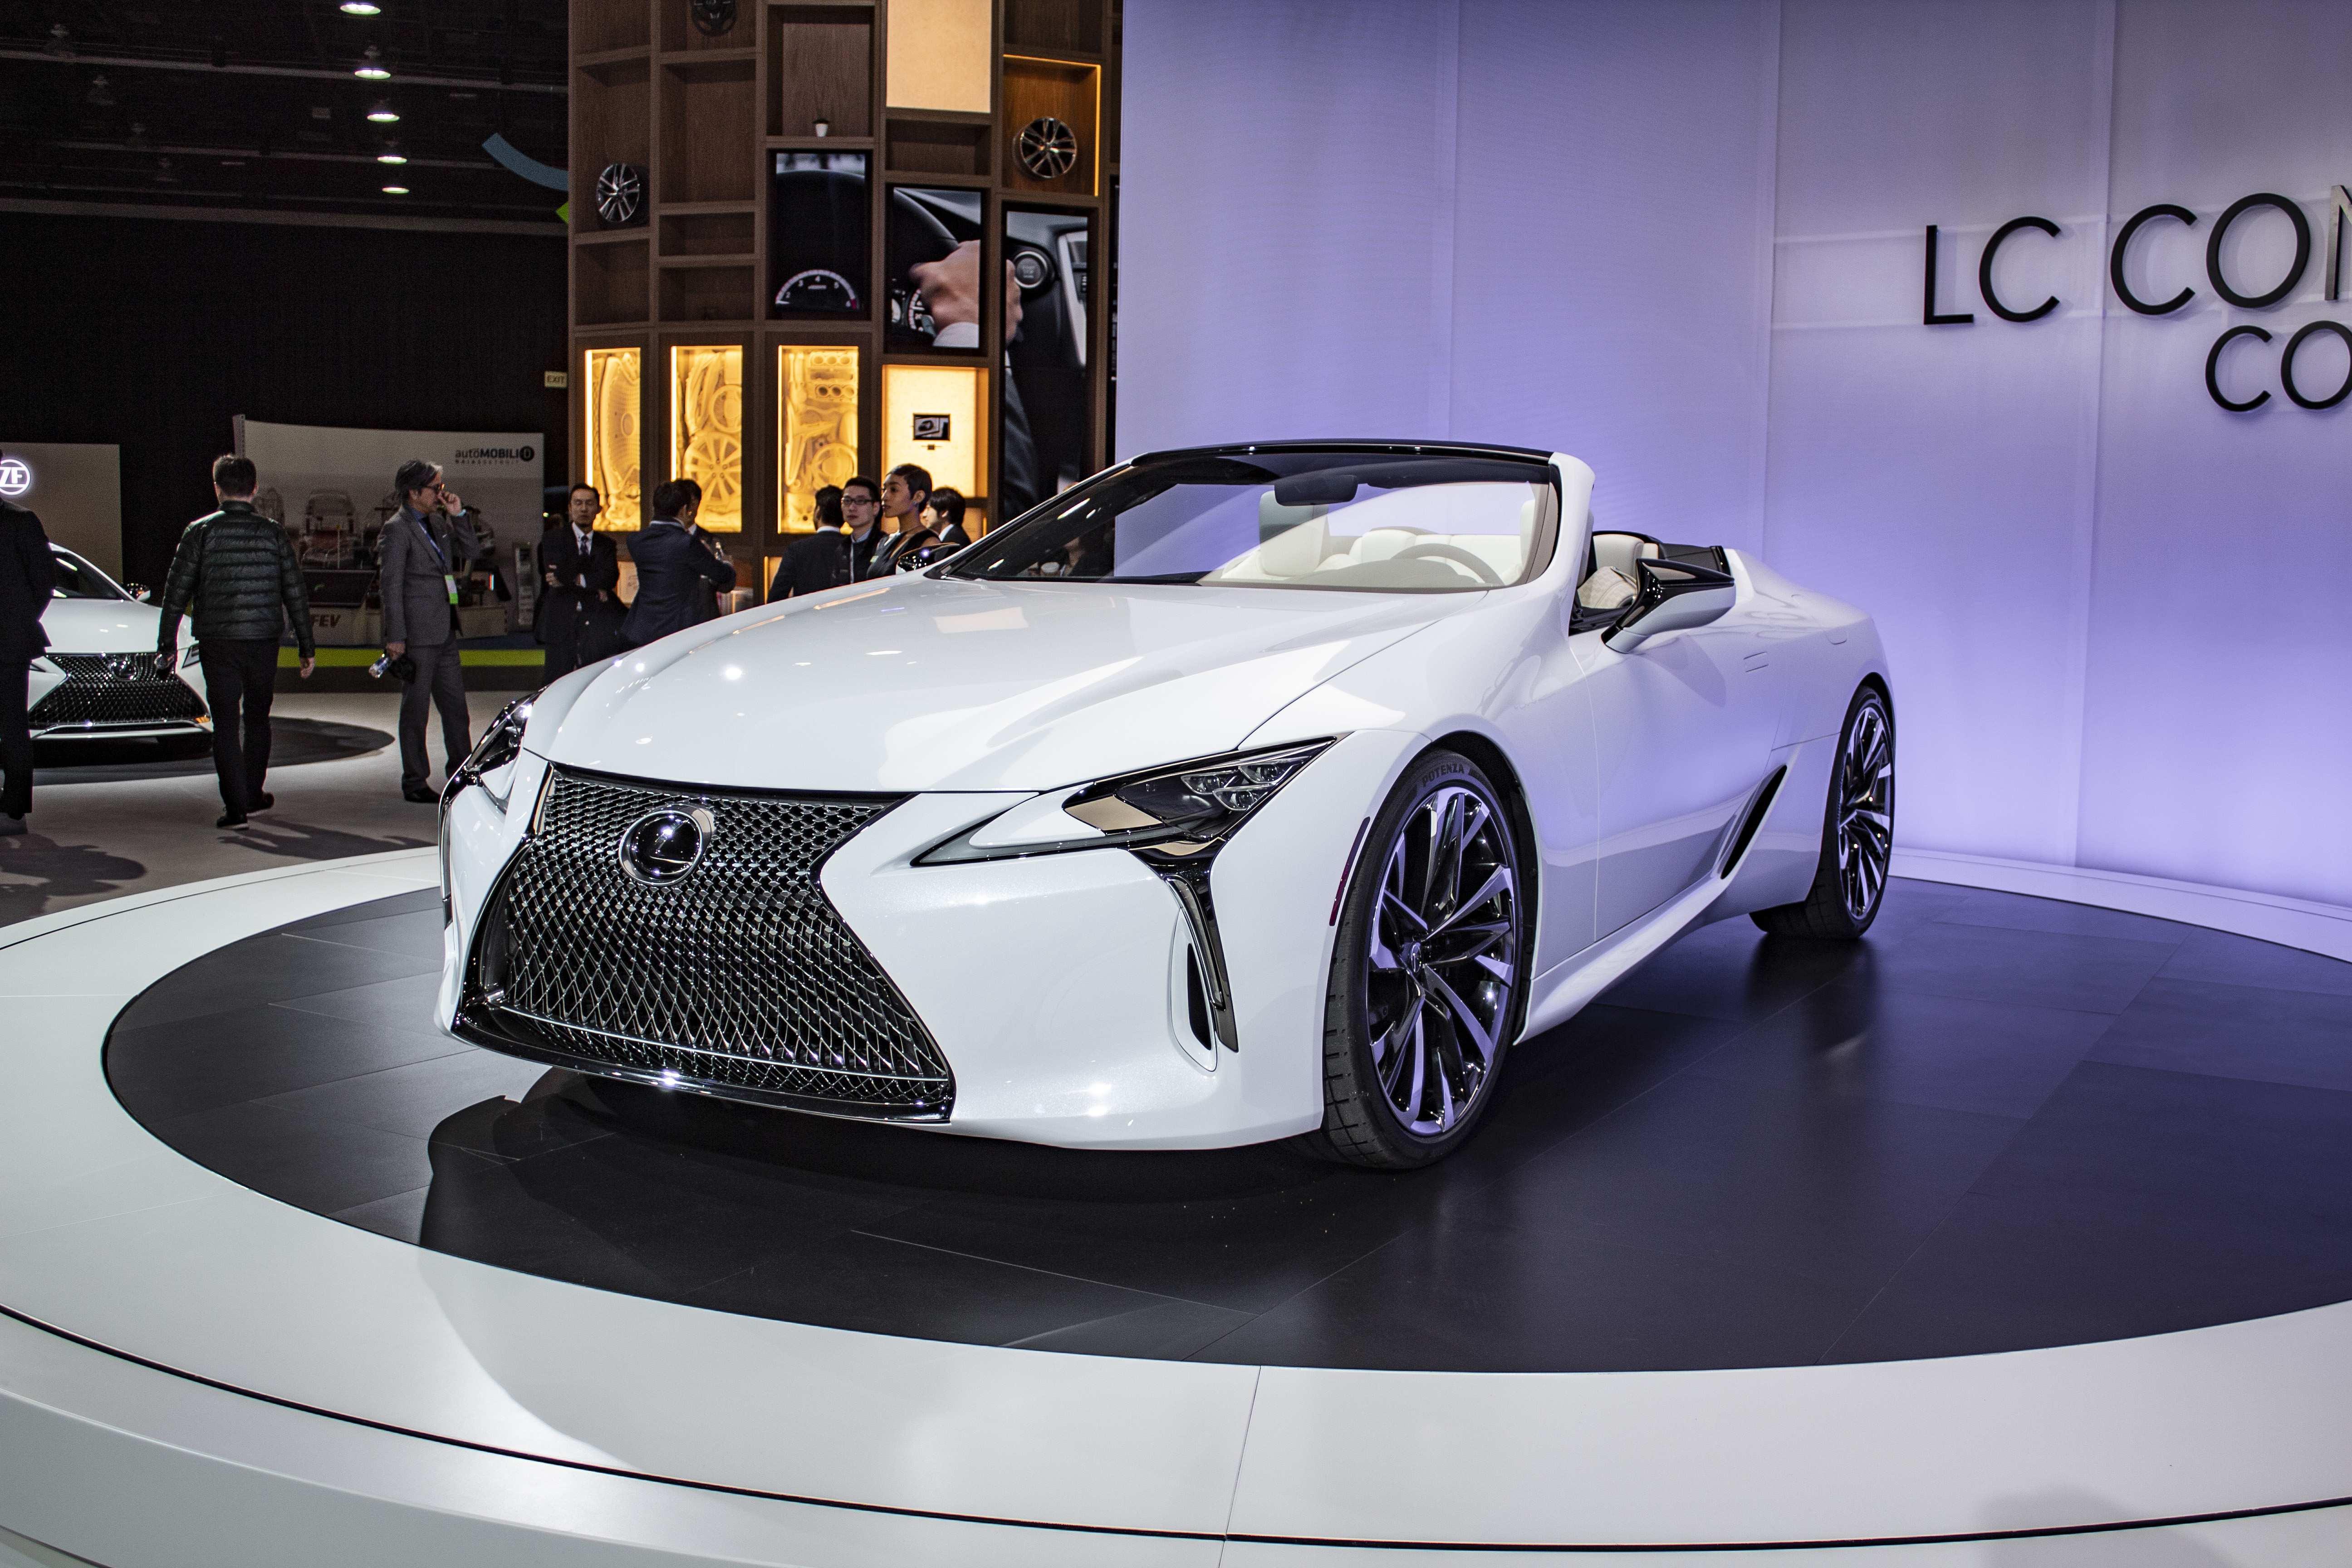 62 New 2019 Lexus Convertible Wallpaper for 2019 Lexus Convertible